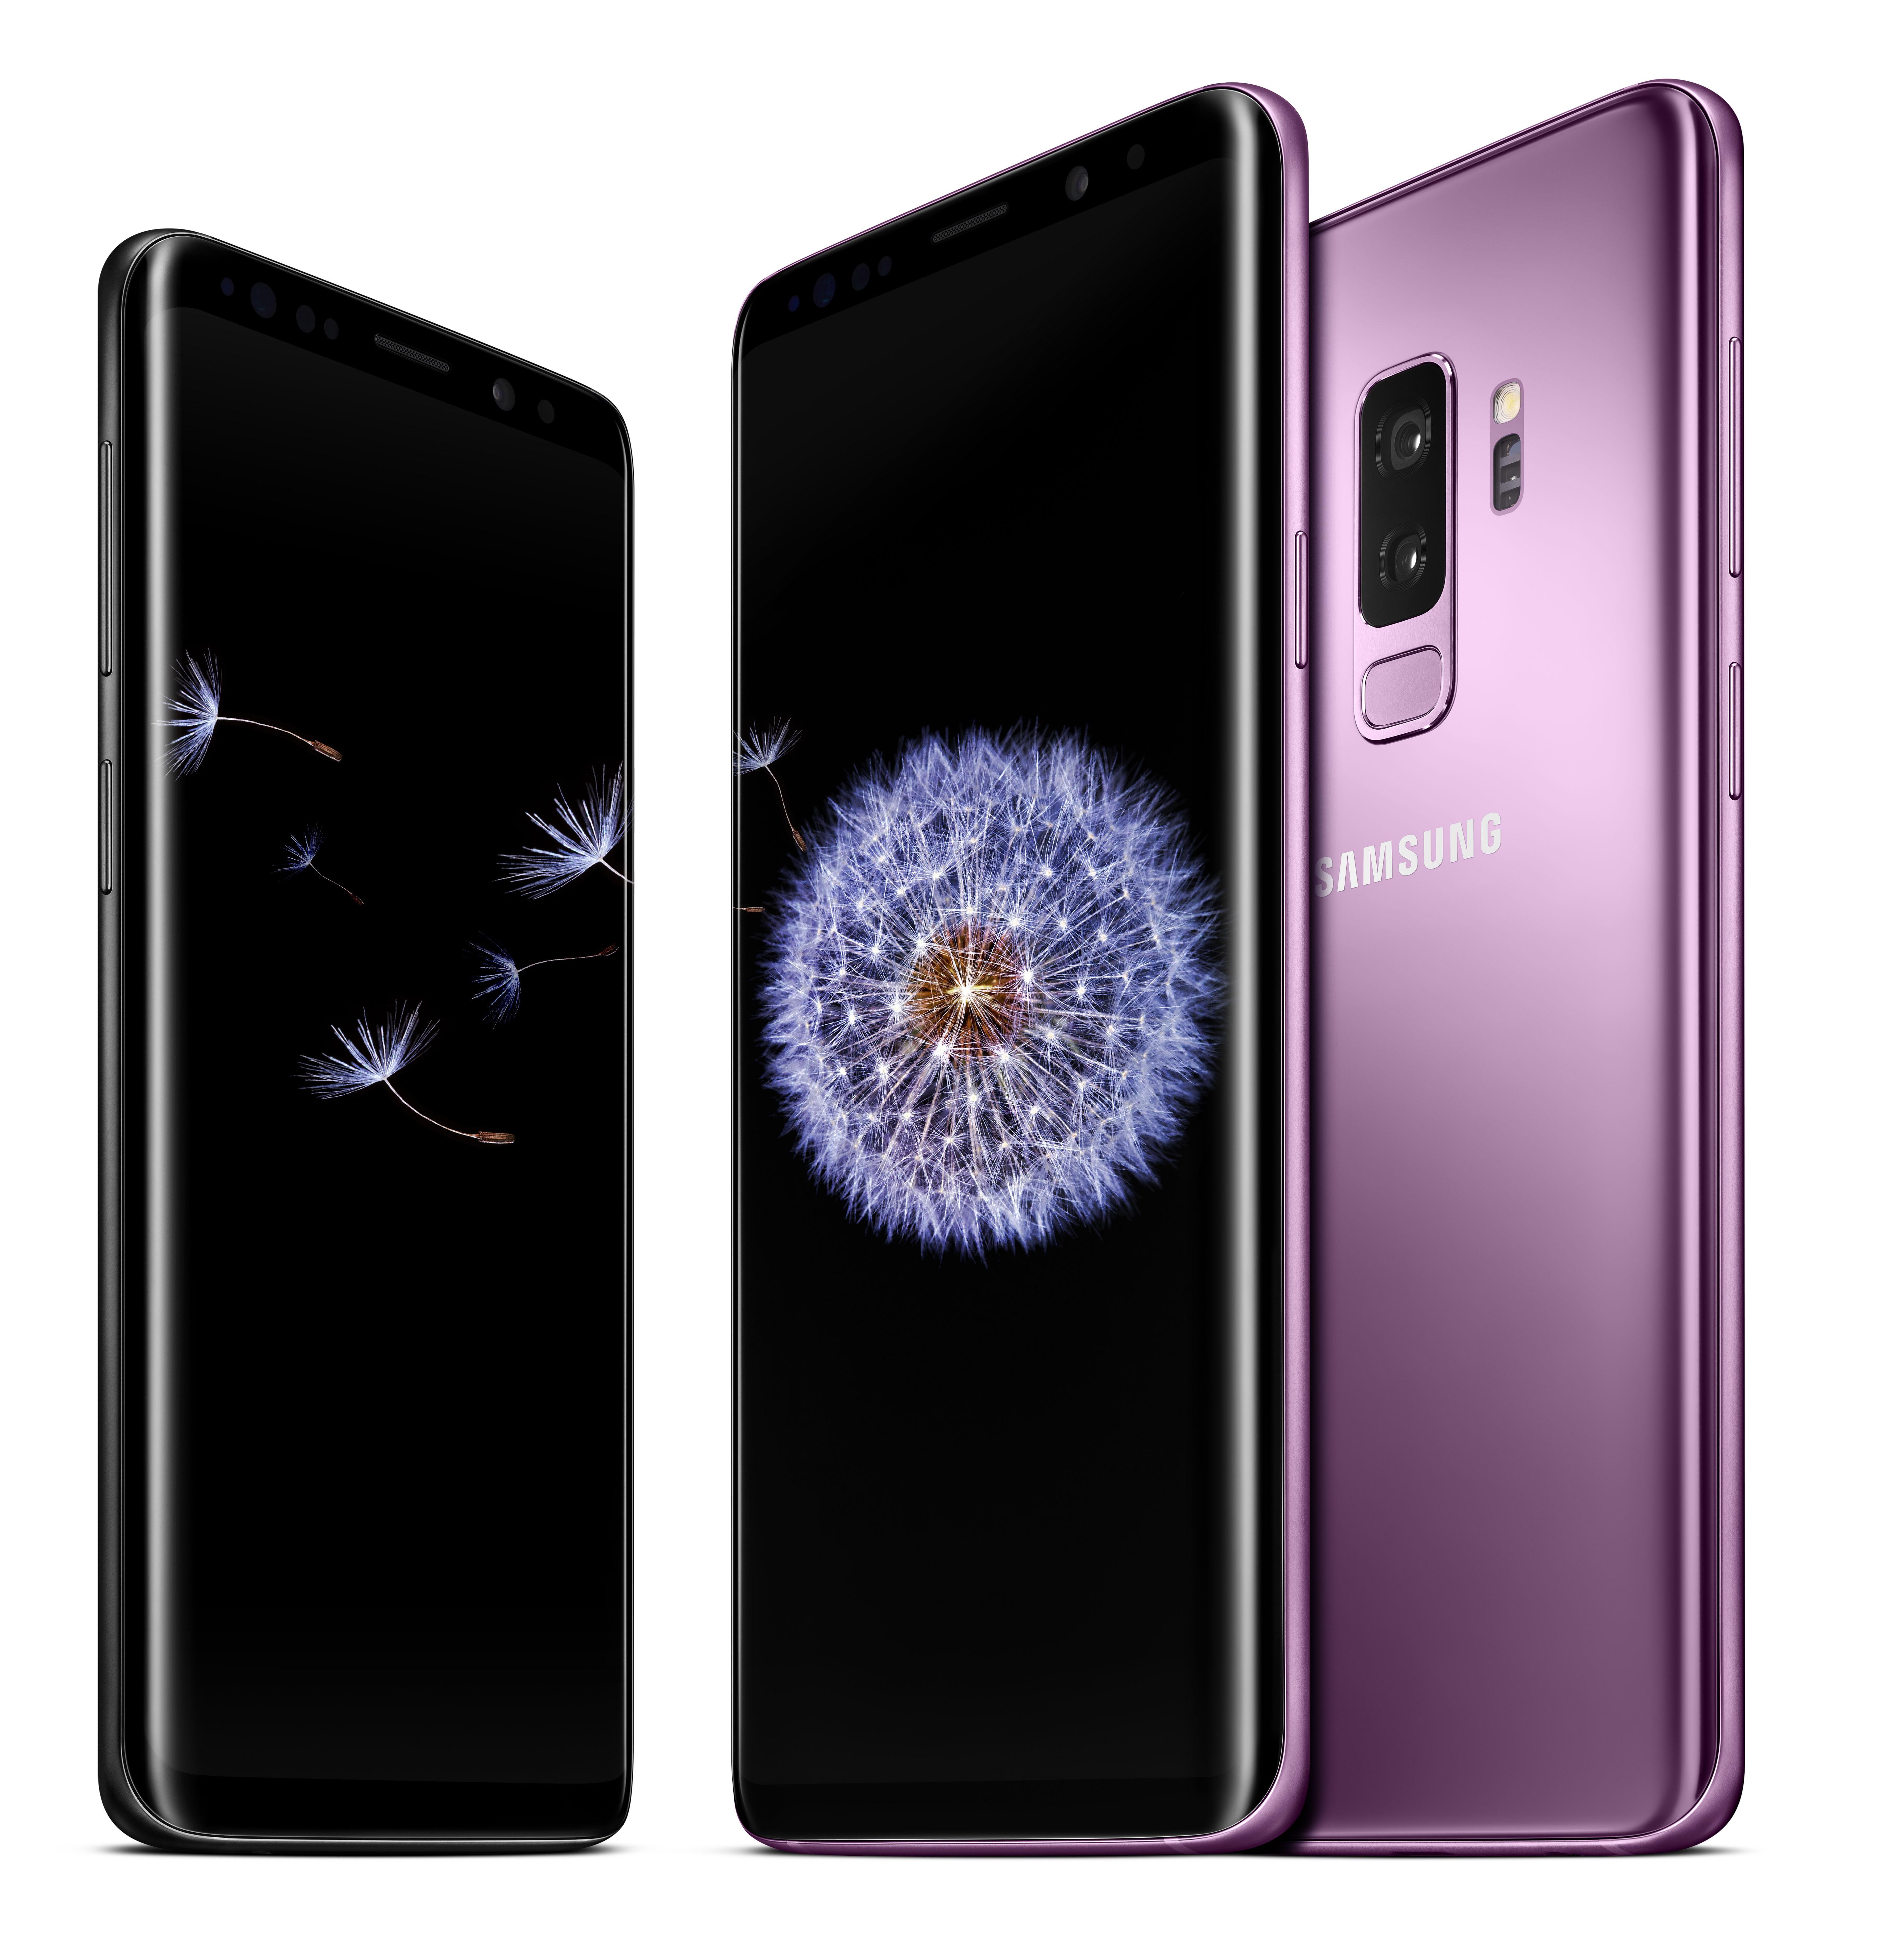 79eeb49efb6 Barcelona, España, 5 de marzo de 2018 – A Samsung Electronics le complace  anunciar que recibió más de 30 premios en el Mobile World Congress 2018, ...